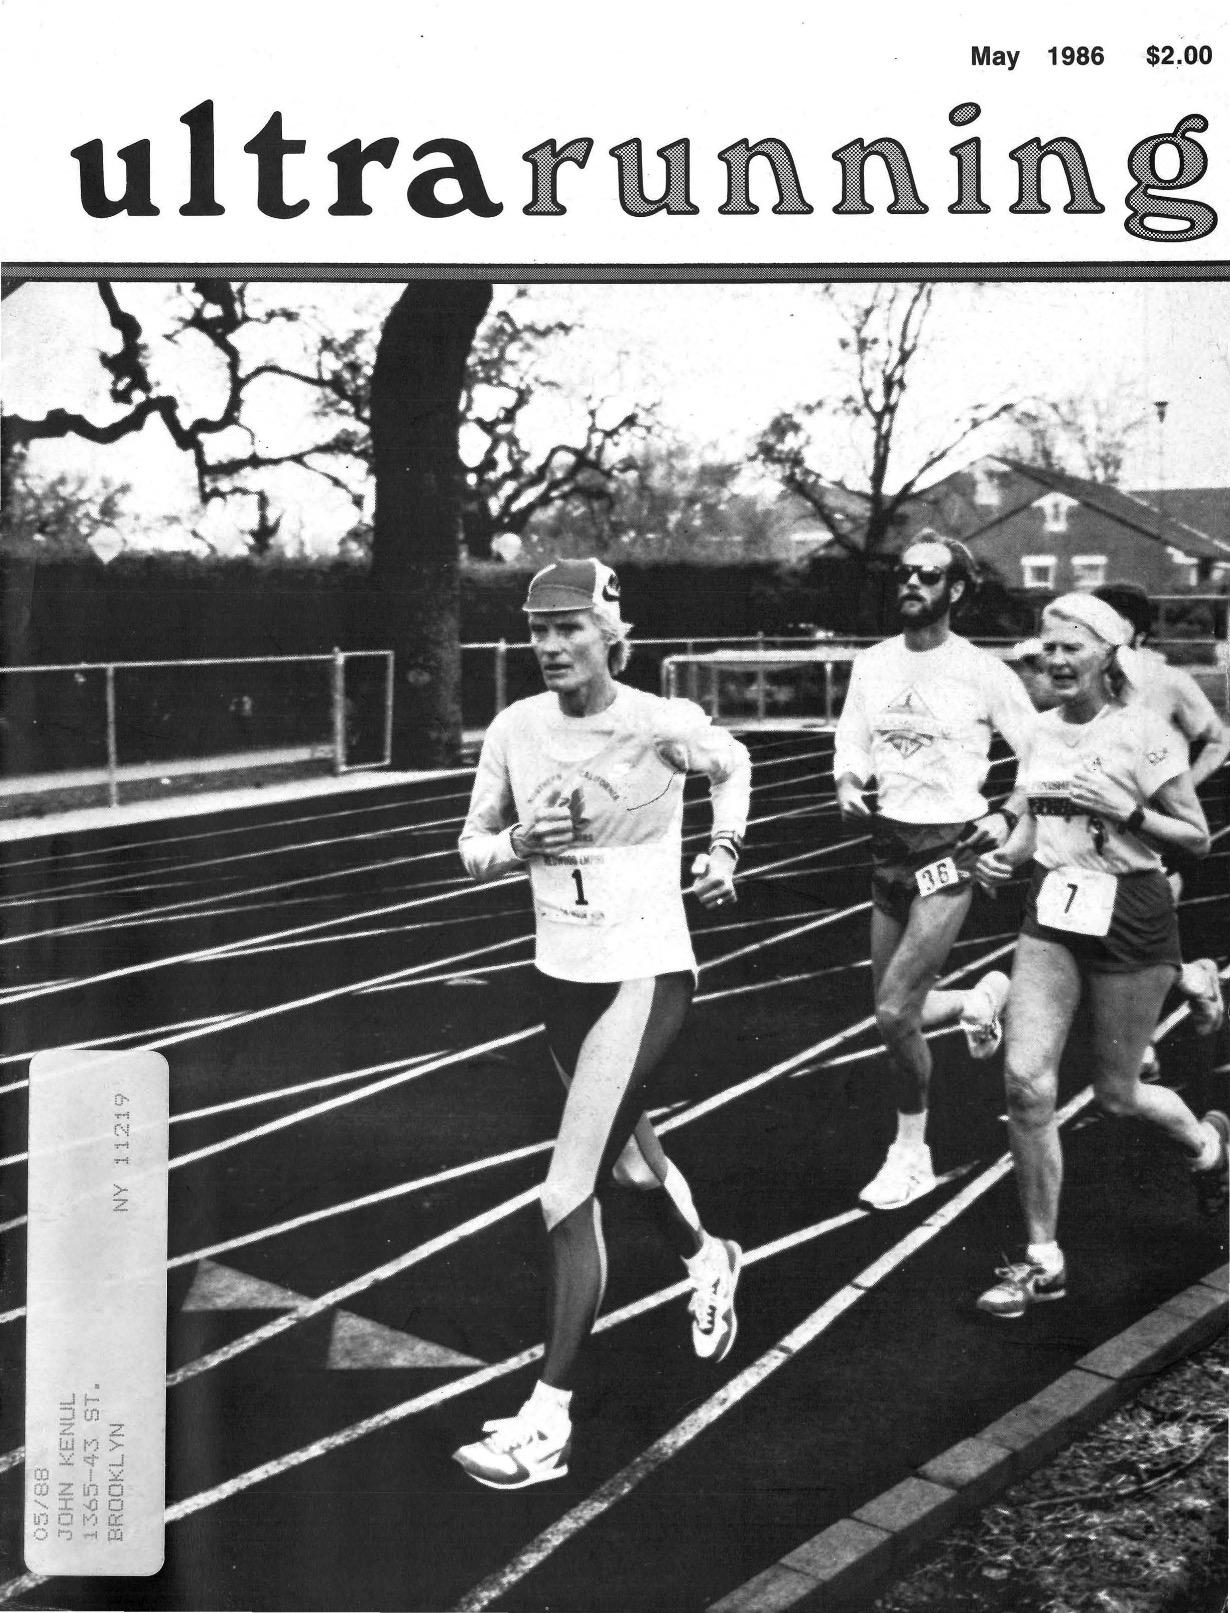 Ultramarathon News Podcasts: Pioneering Ultrarunner Ruth Anderson